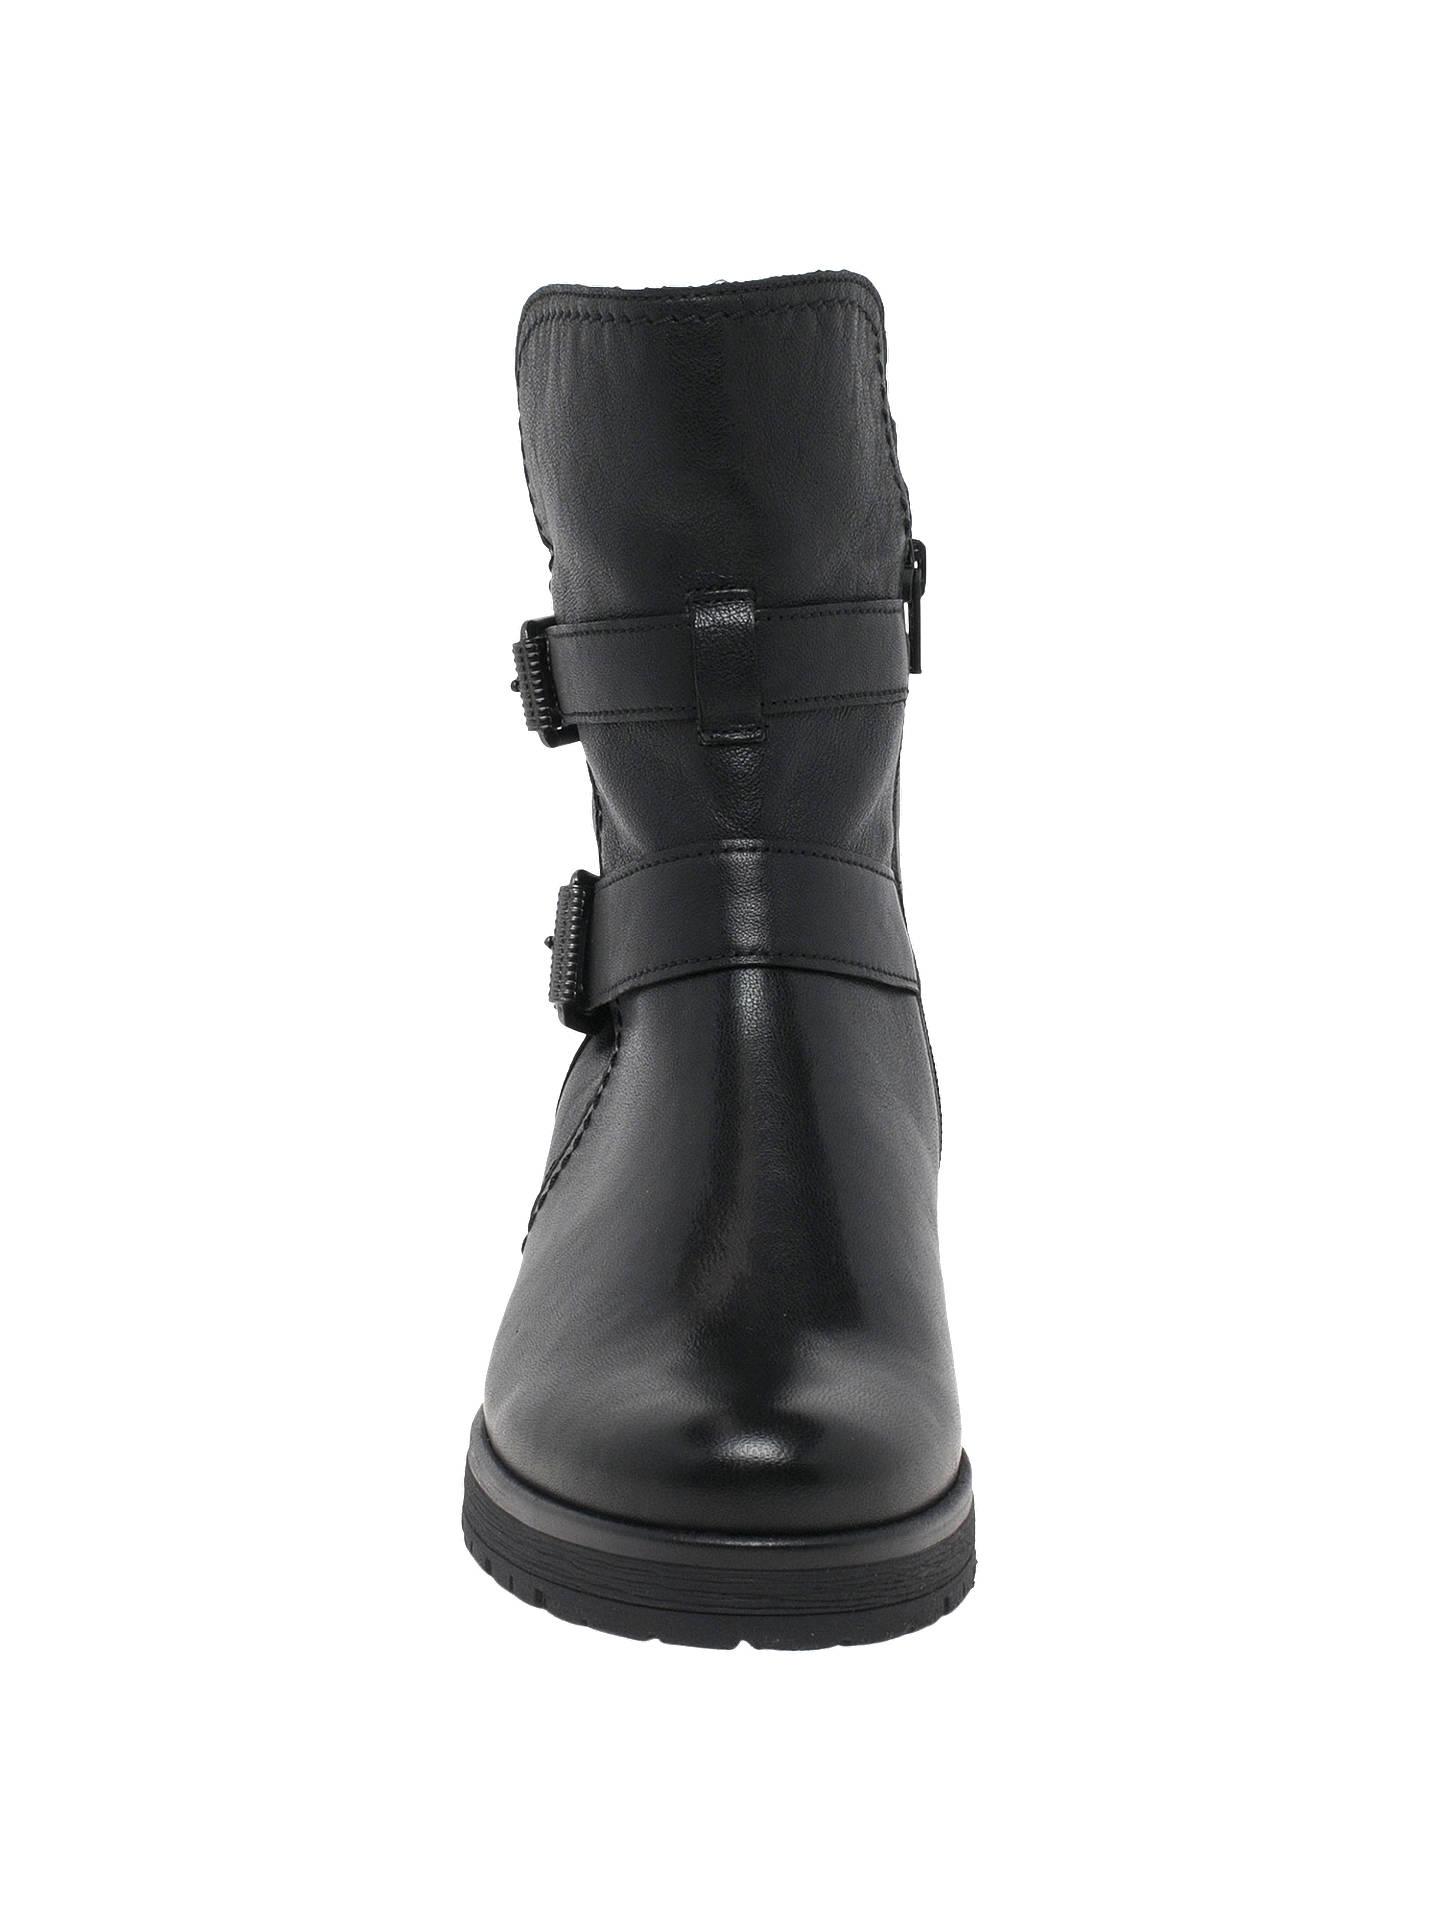 ba97933775d75 ... Buy Gabor Shiraz Wide Fit Boots, Black Leather, 3 Online at  johnlewis.com ...